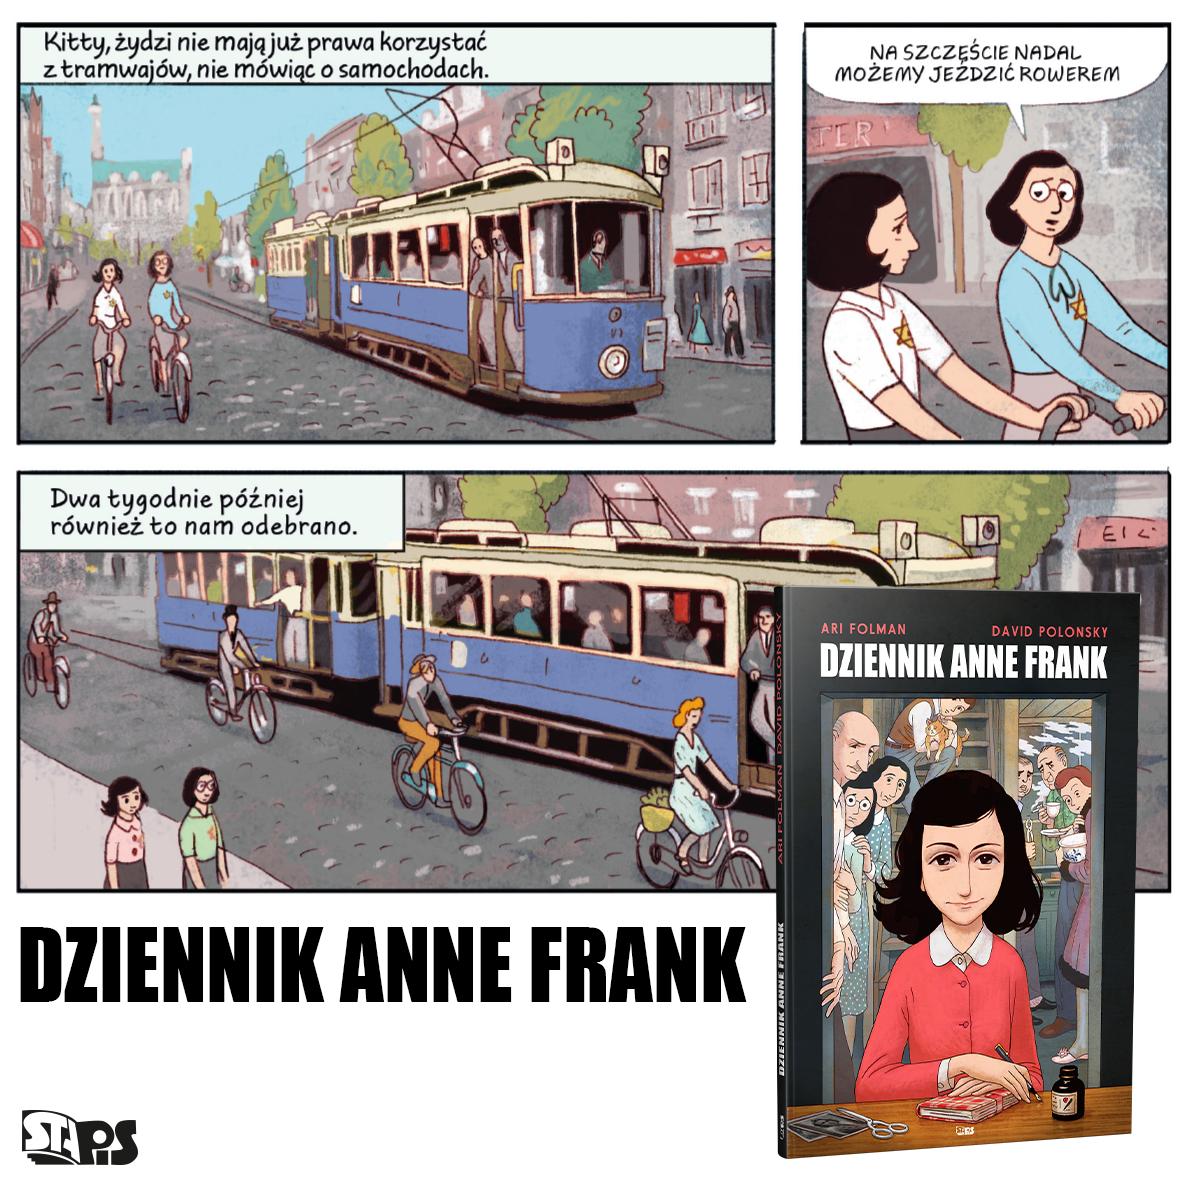 Dziennik Anne Frank komiks